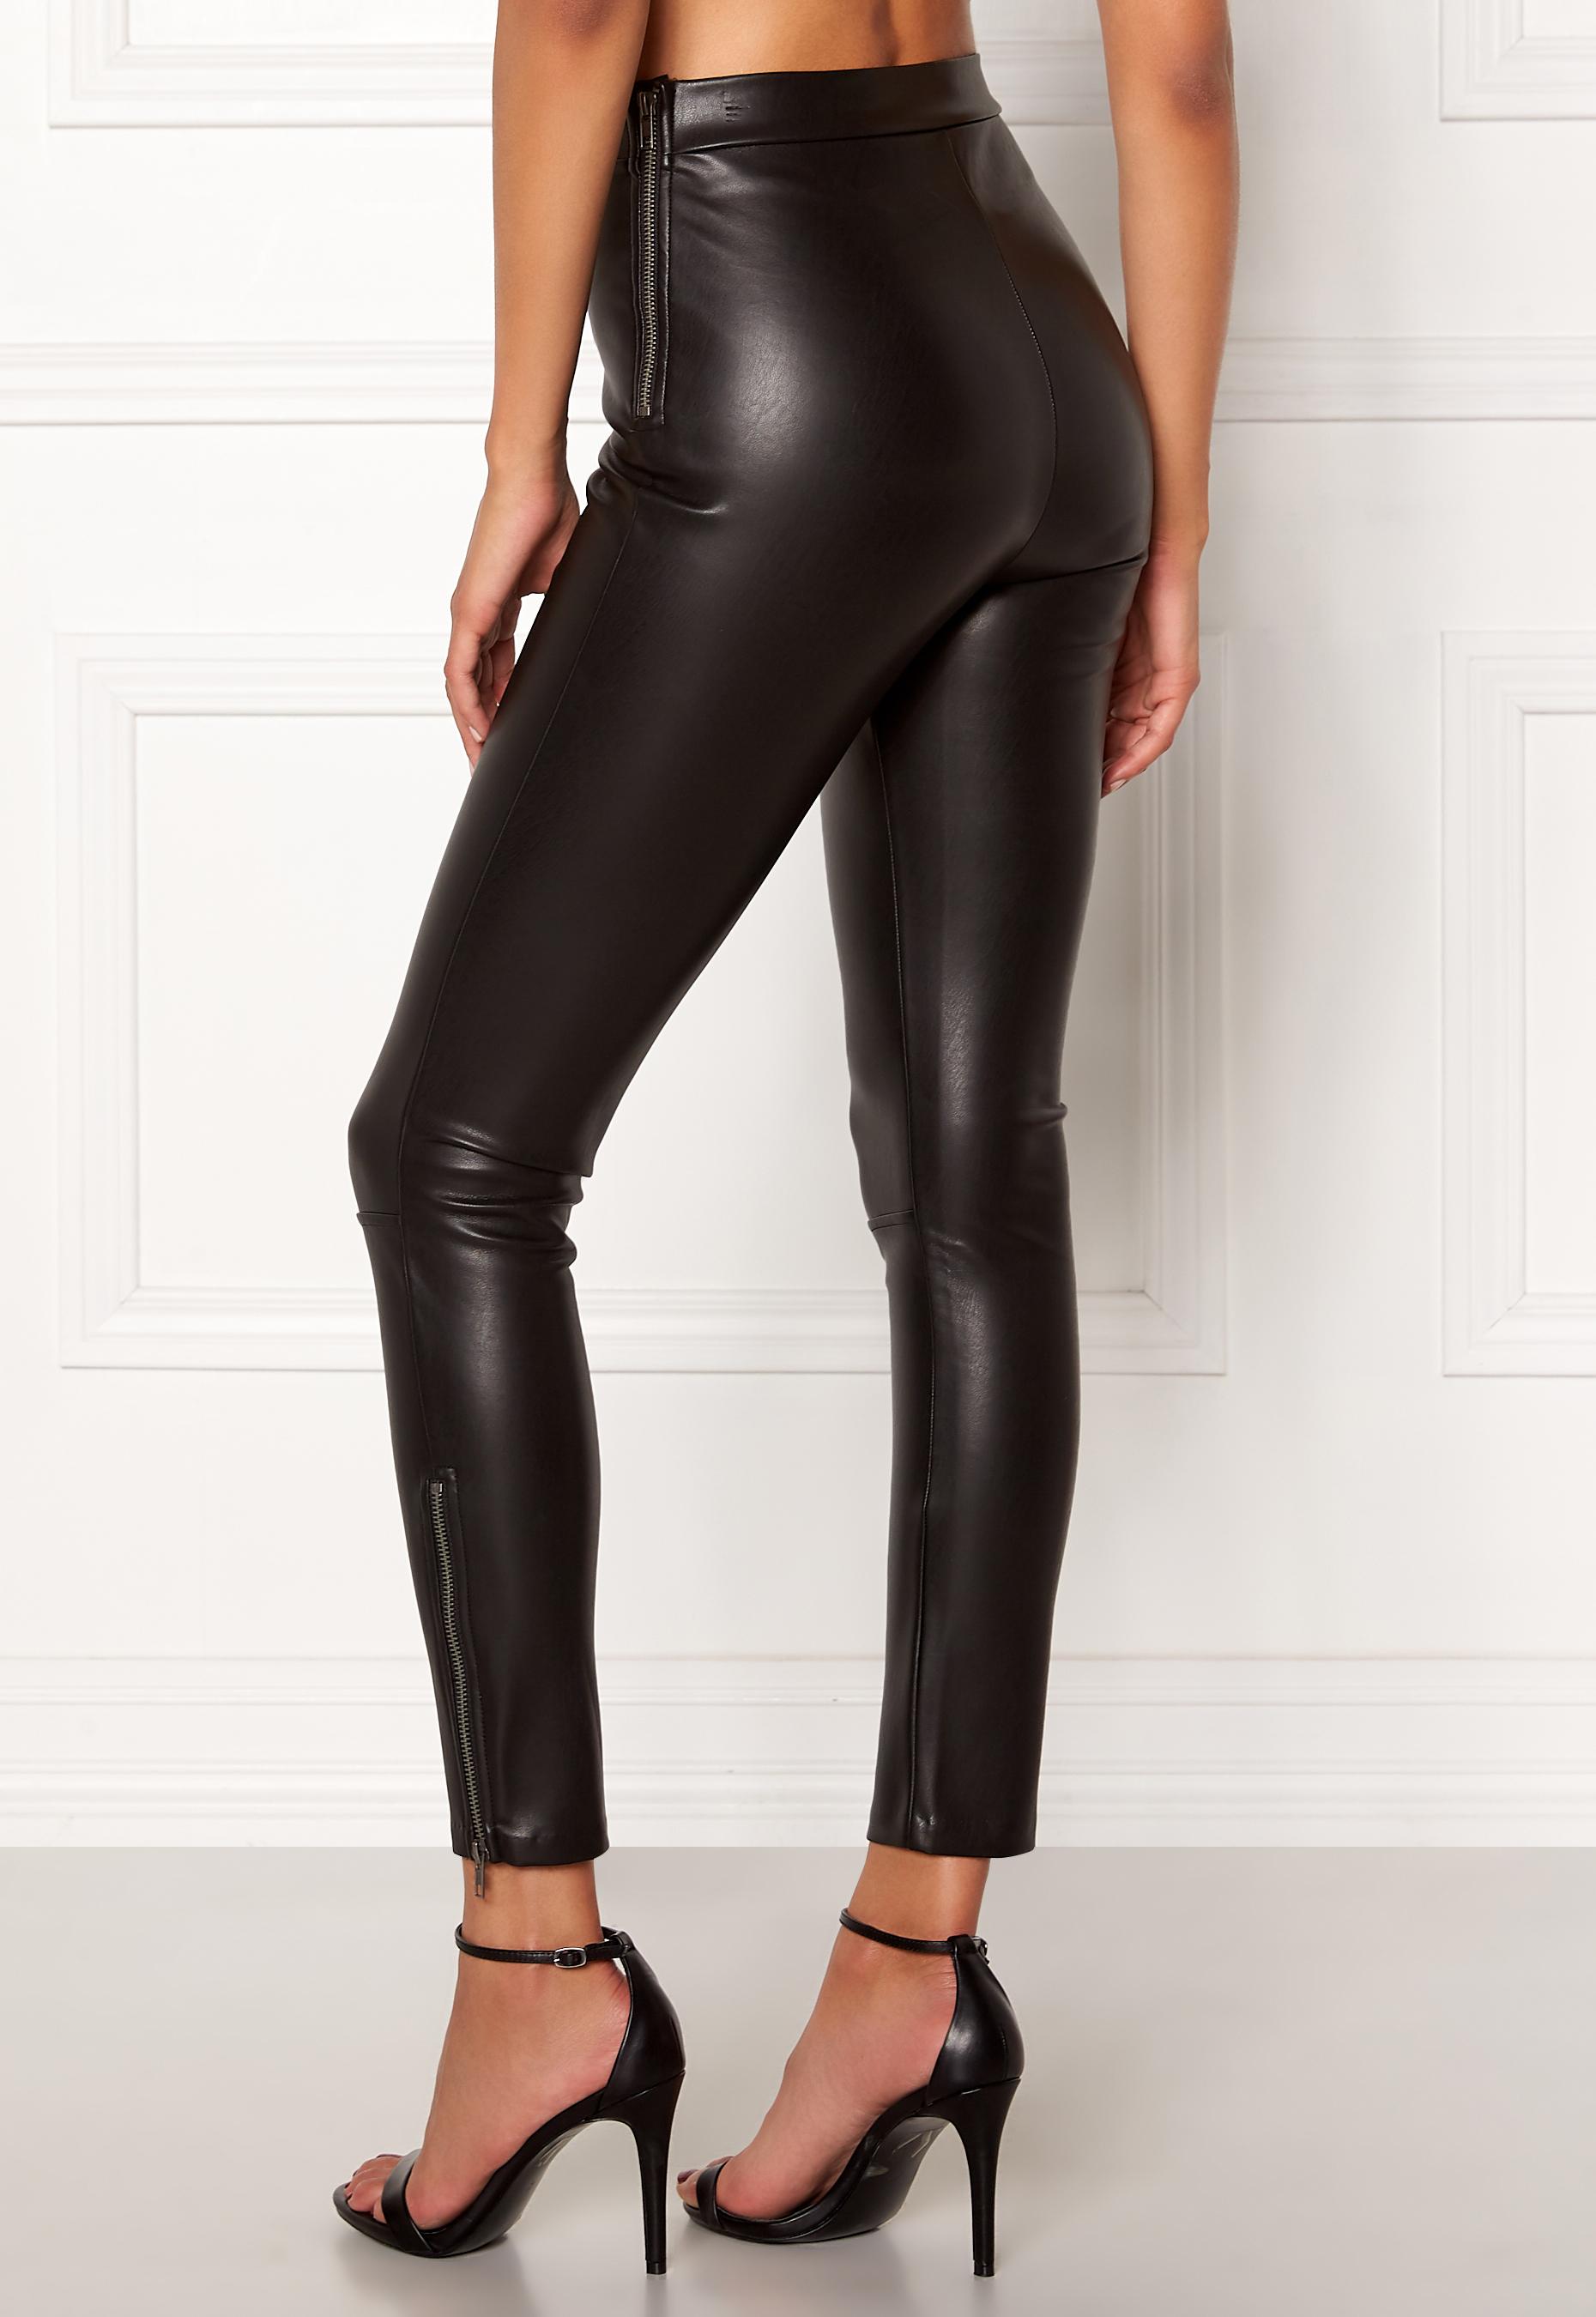 Chiara Forthi Jazzy trousers Black - Bubbleroom 539bddf15e926